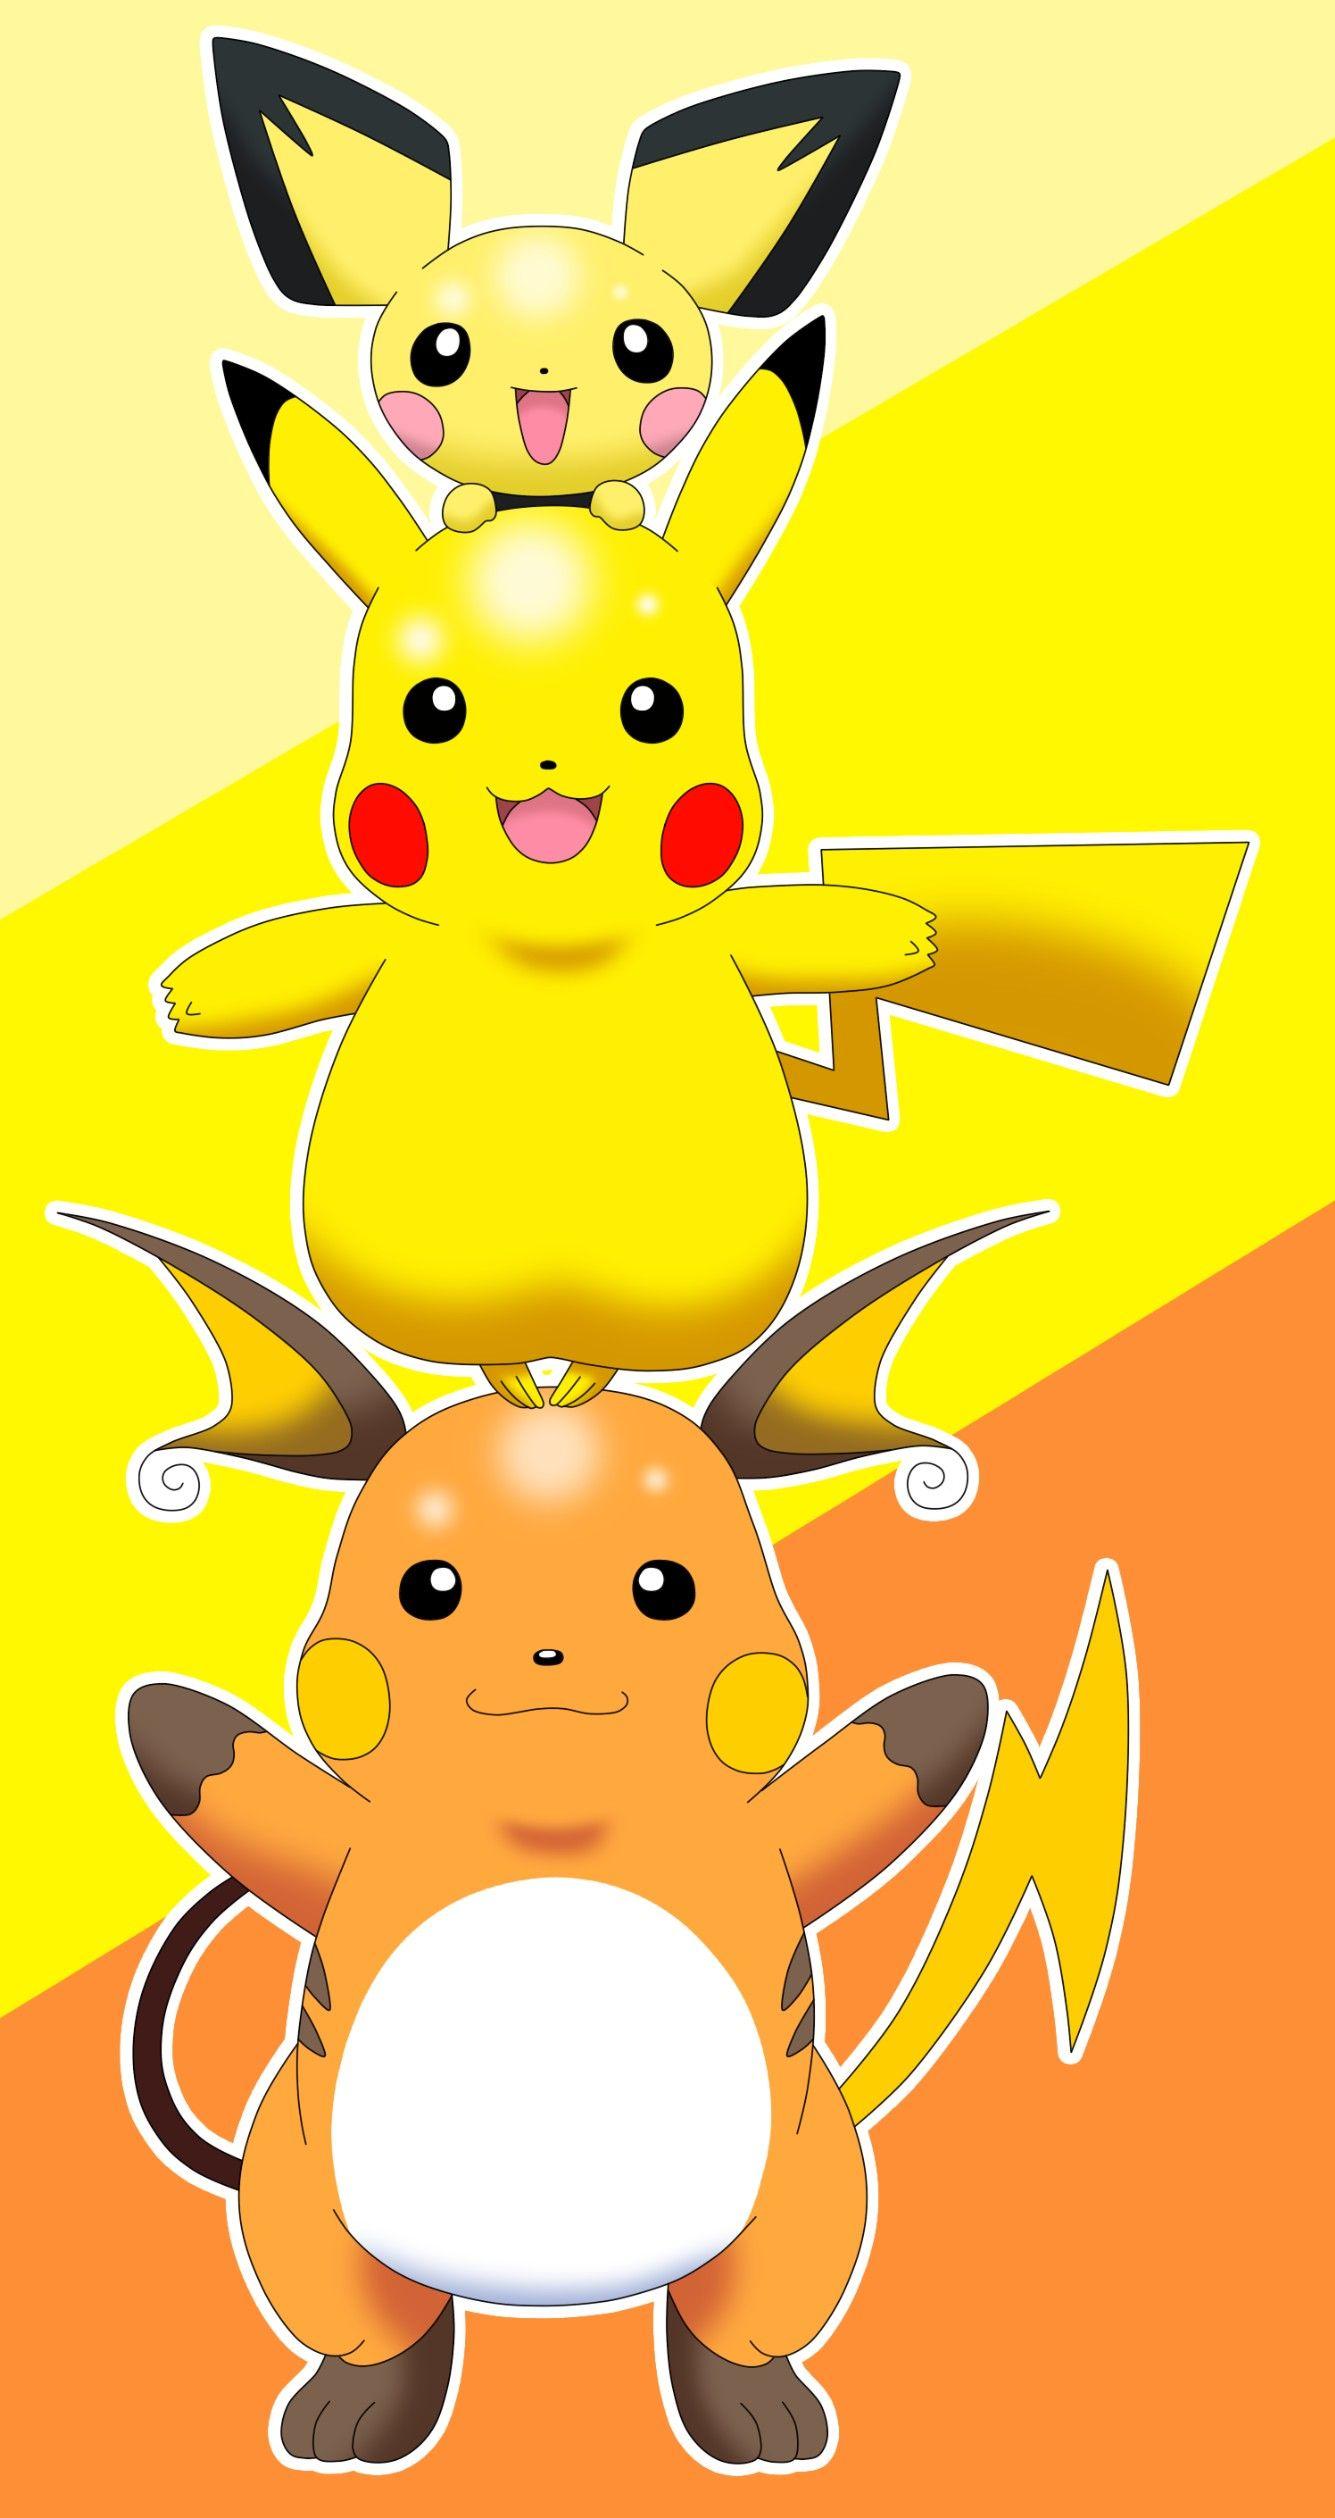 Pichu Pikachu Raichu Electric Totem Pokemon Pikachu Raichu